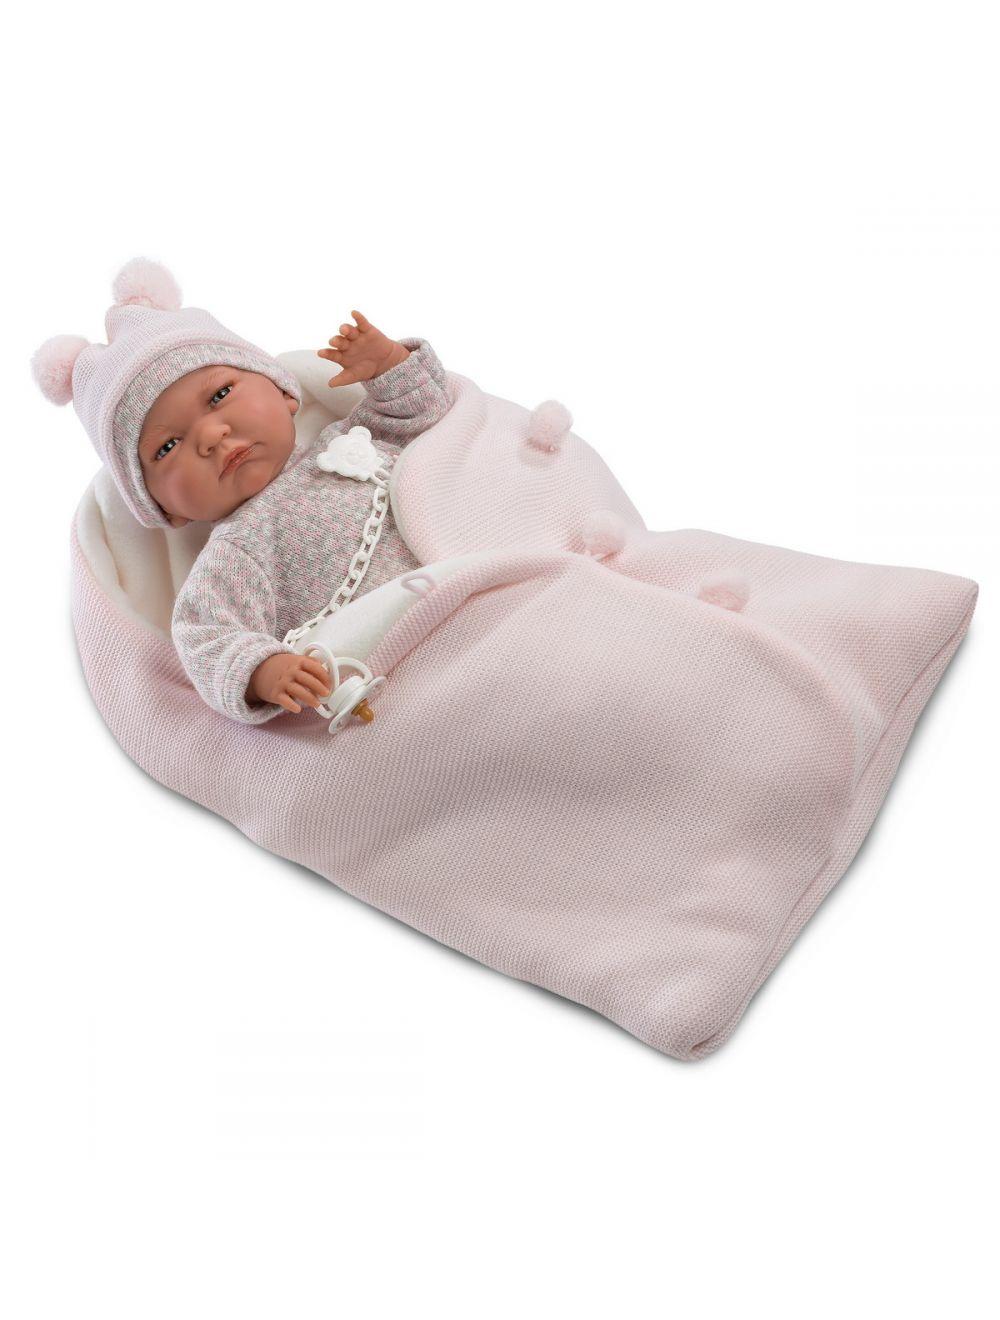 Llorens Lala noworodek w różowym beciku 42 cm